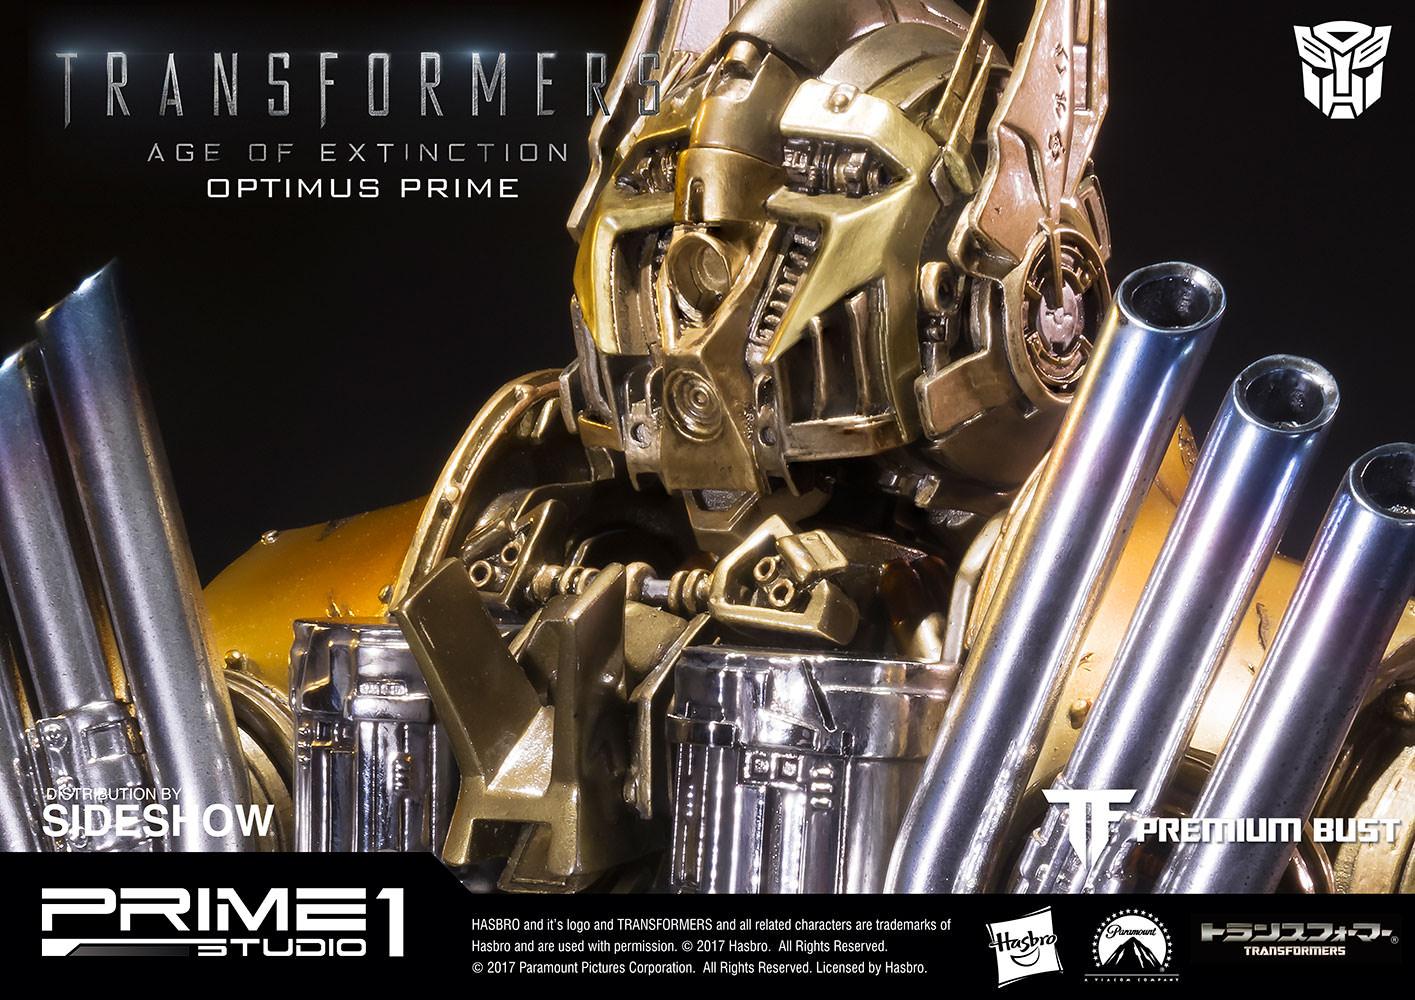 [Bild: 902733-optimus-prime-gold-version-03.jpg]